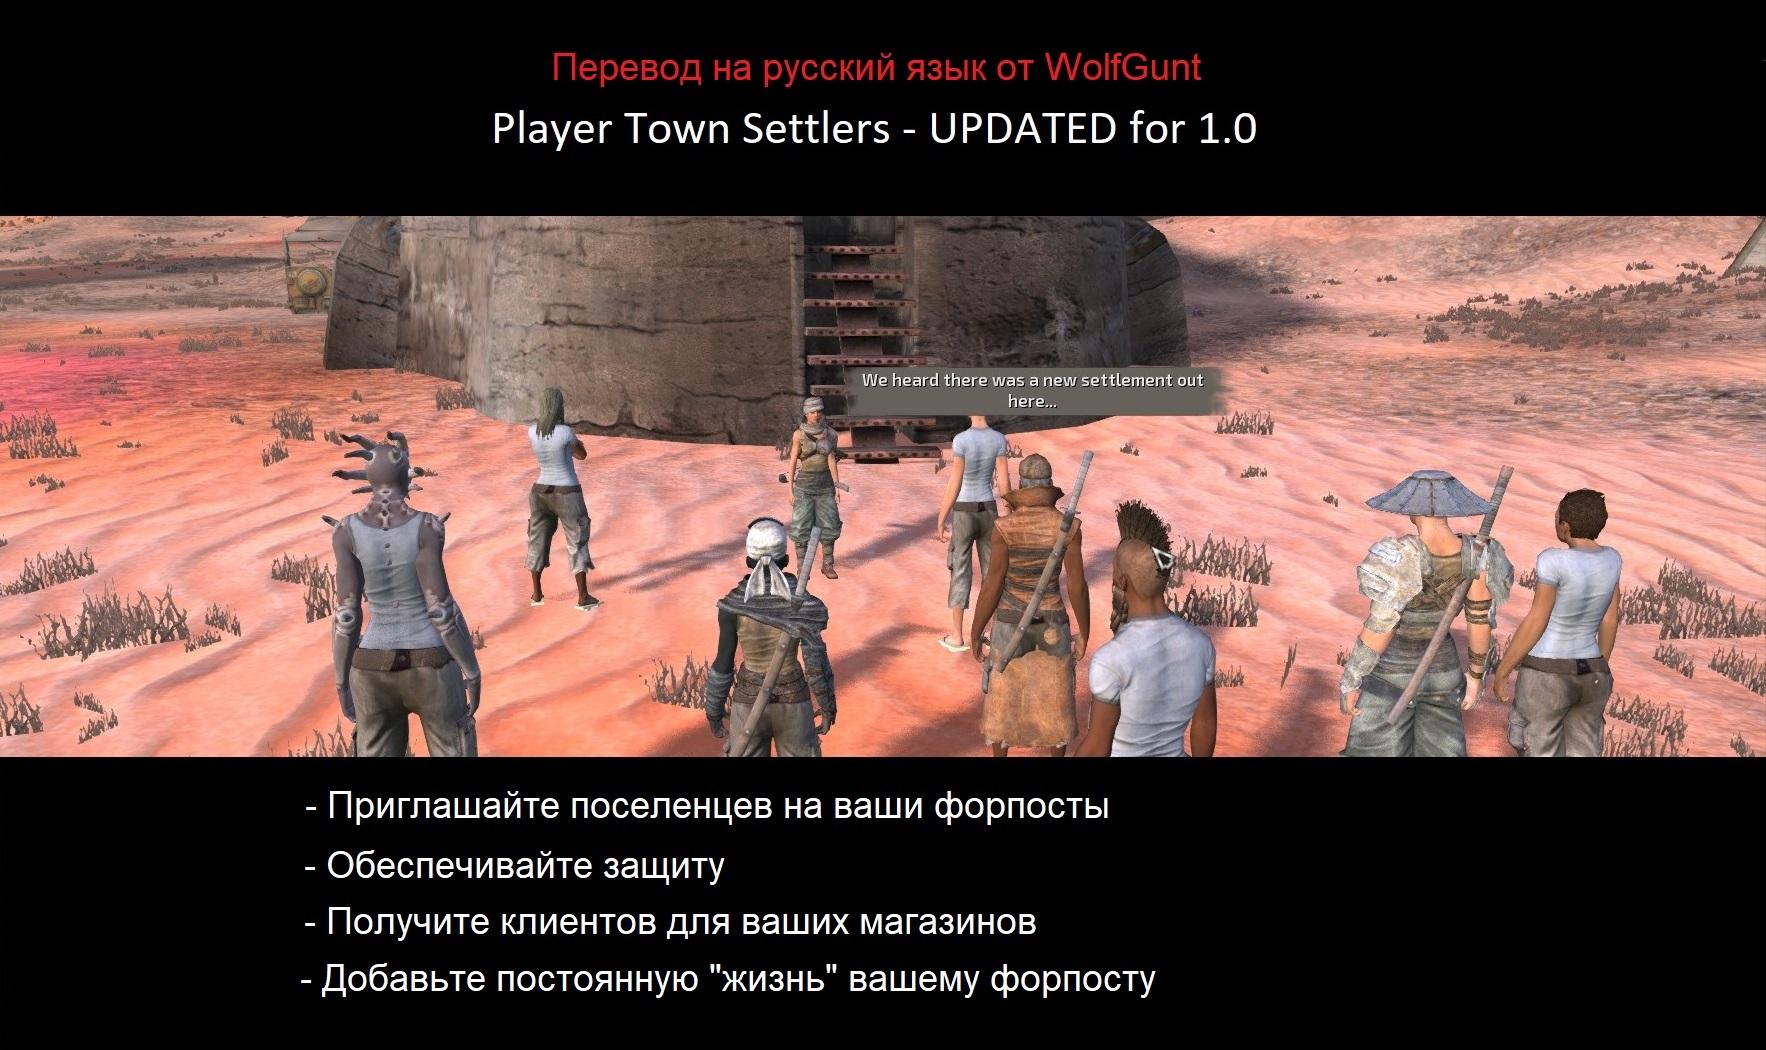 Player Town Settlers / Скитальцы в поселение